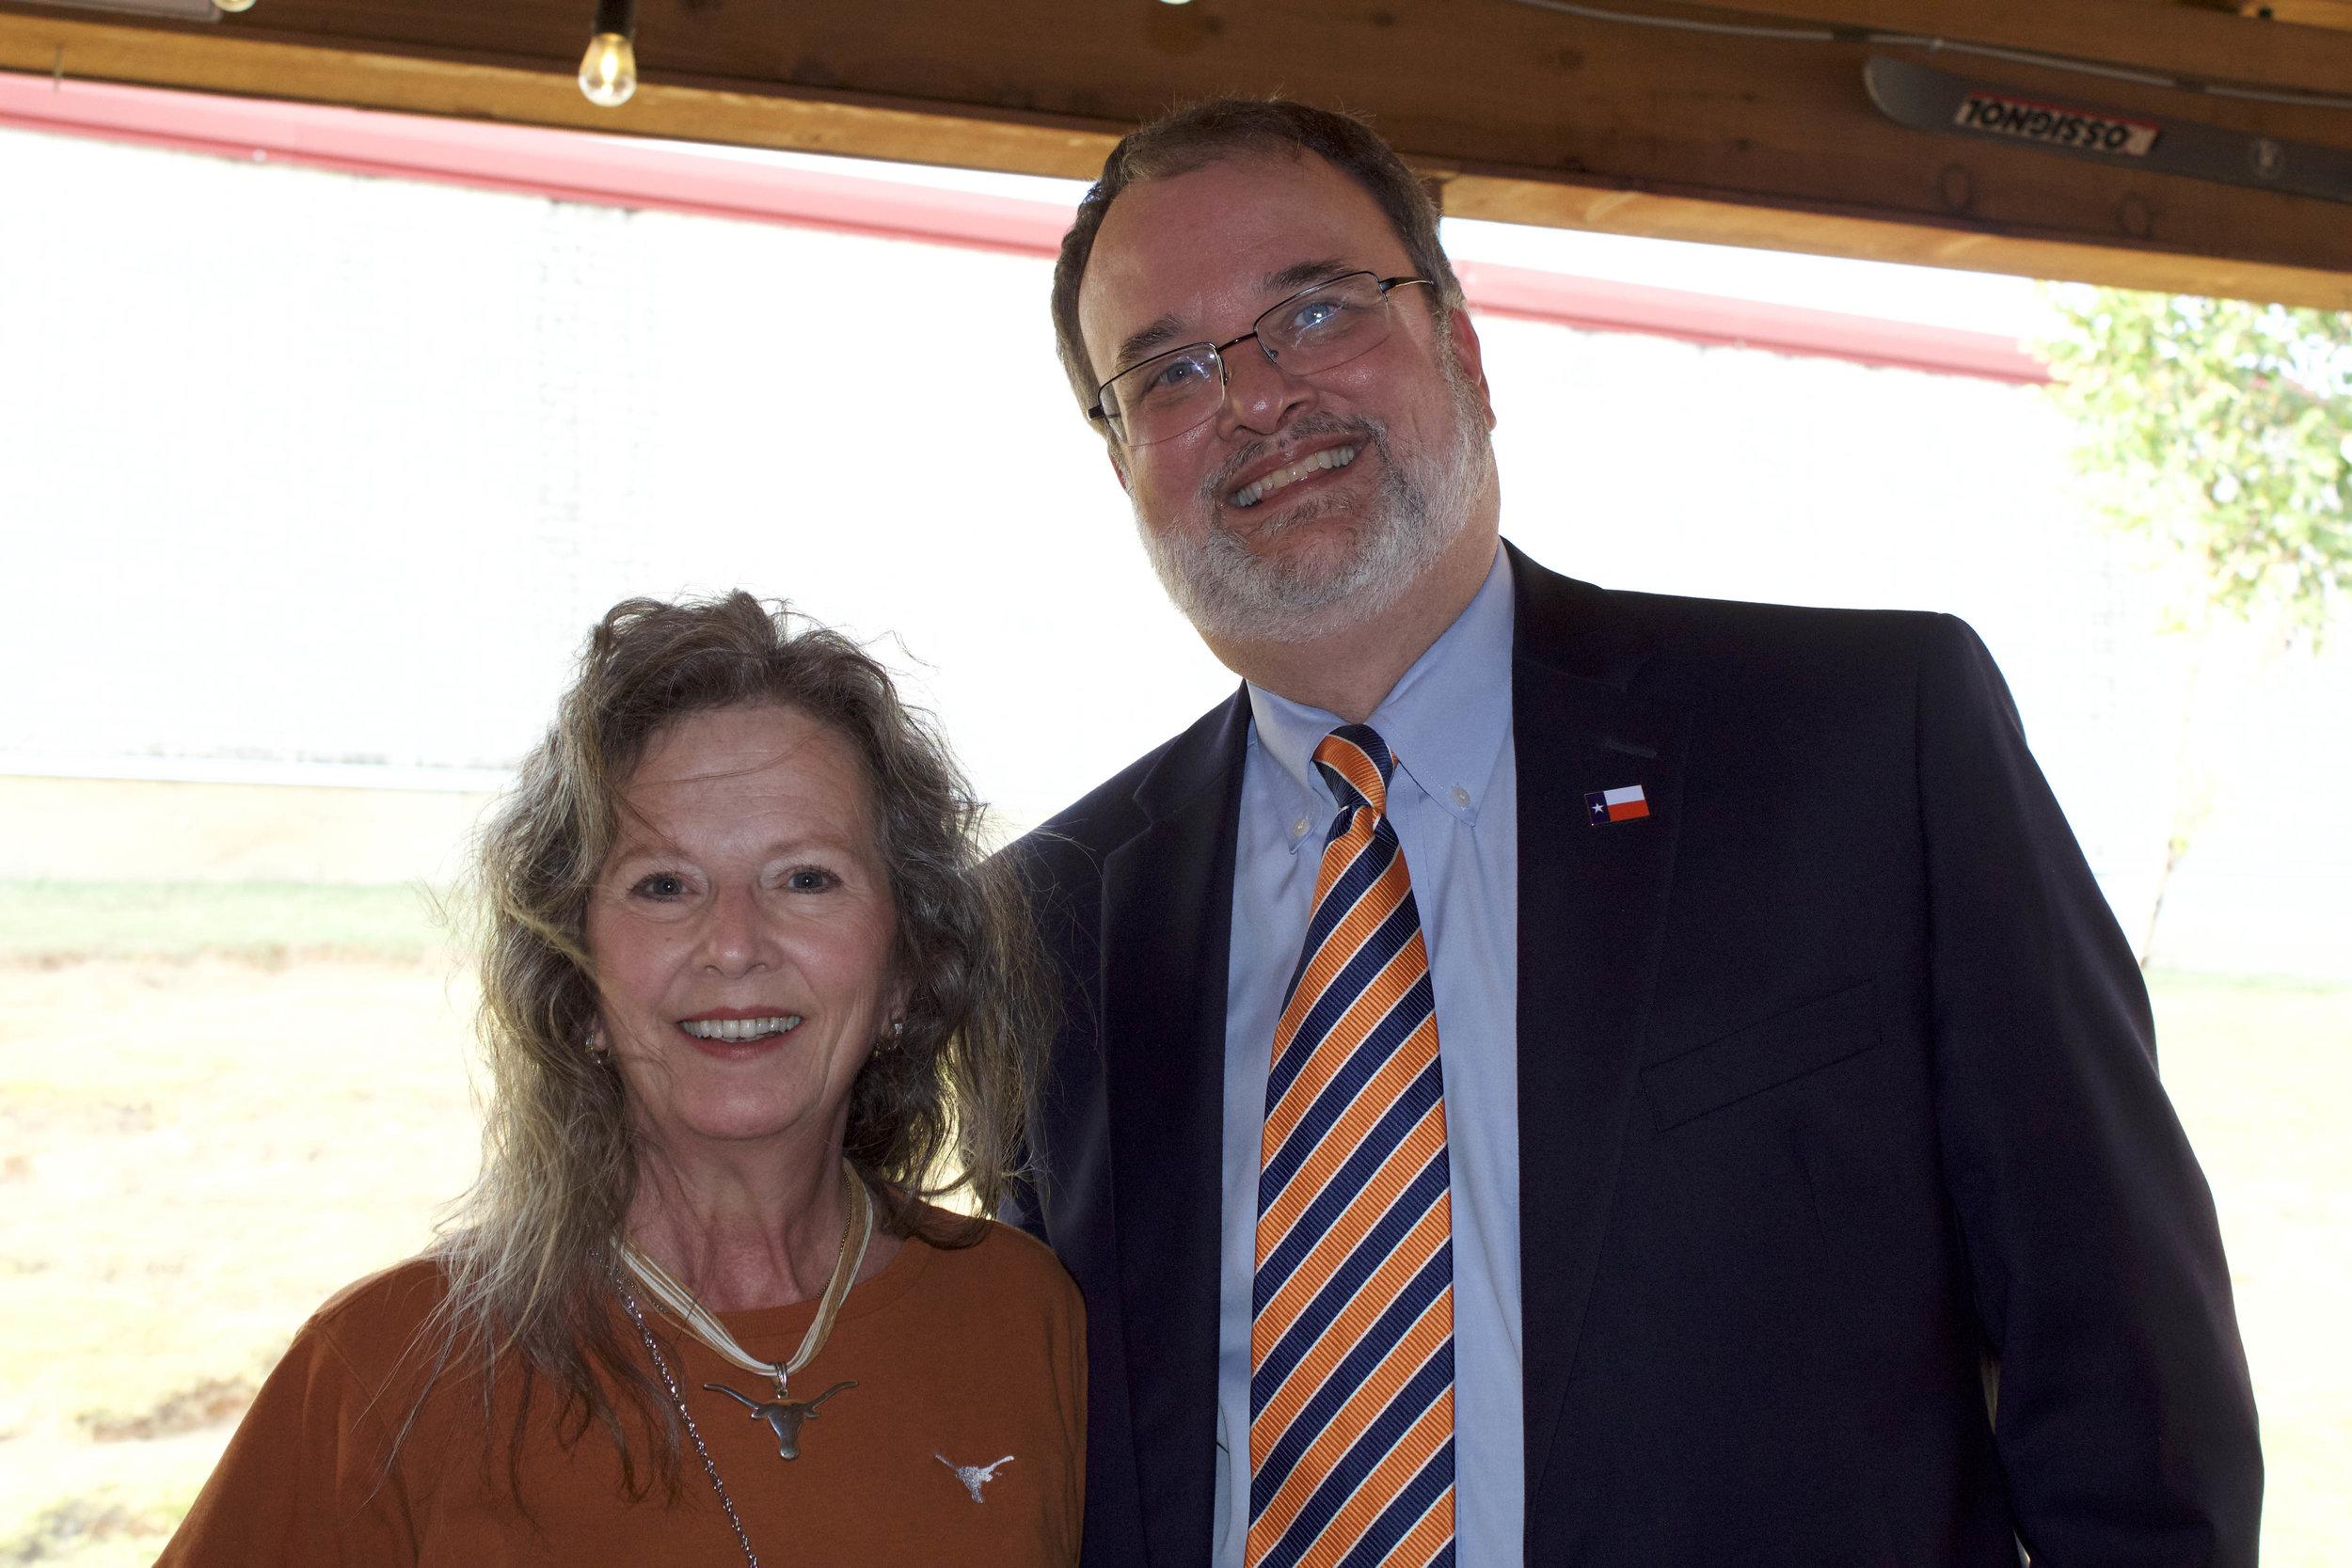 Dr. Wanda Northam and the Hon. Craig Henry